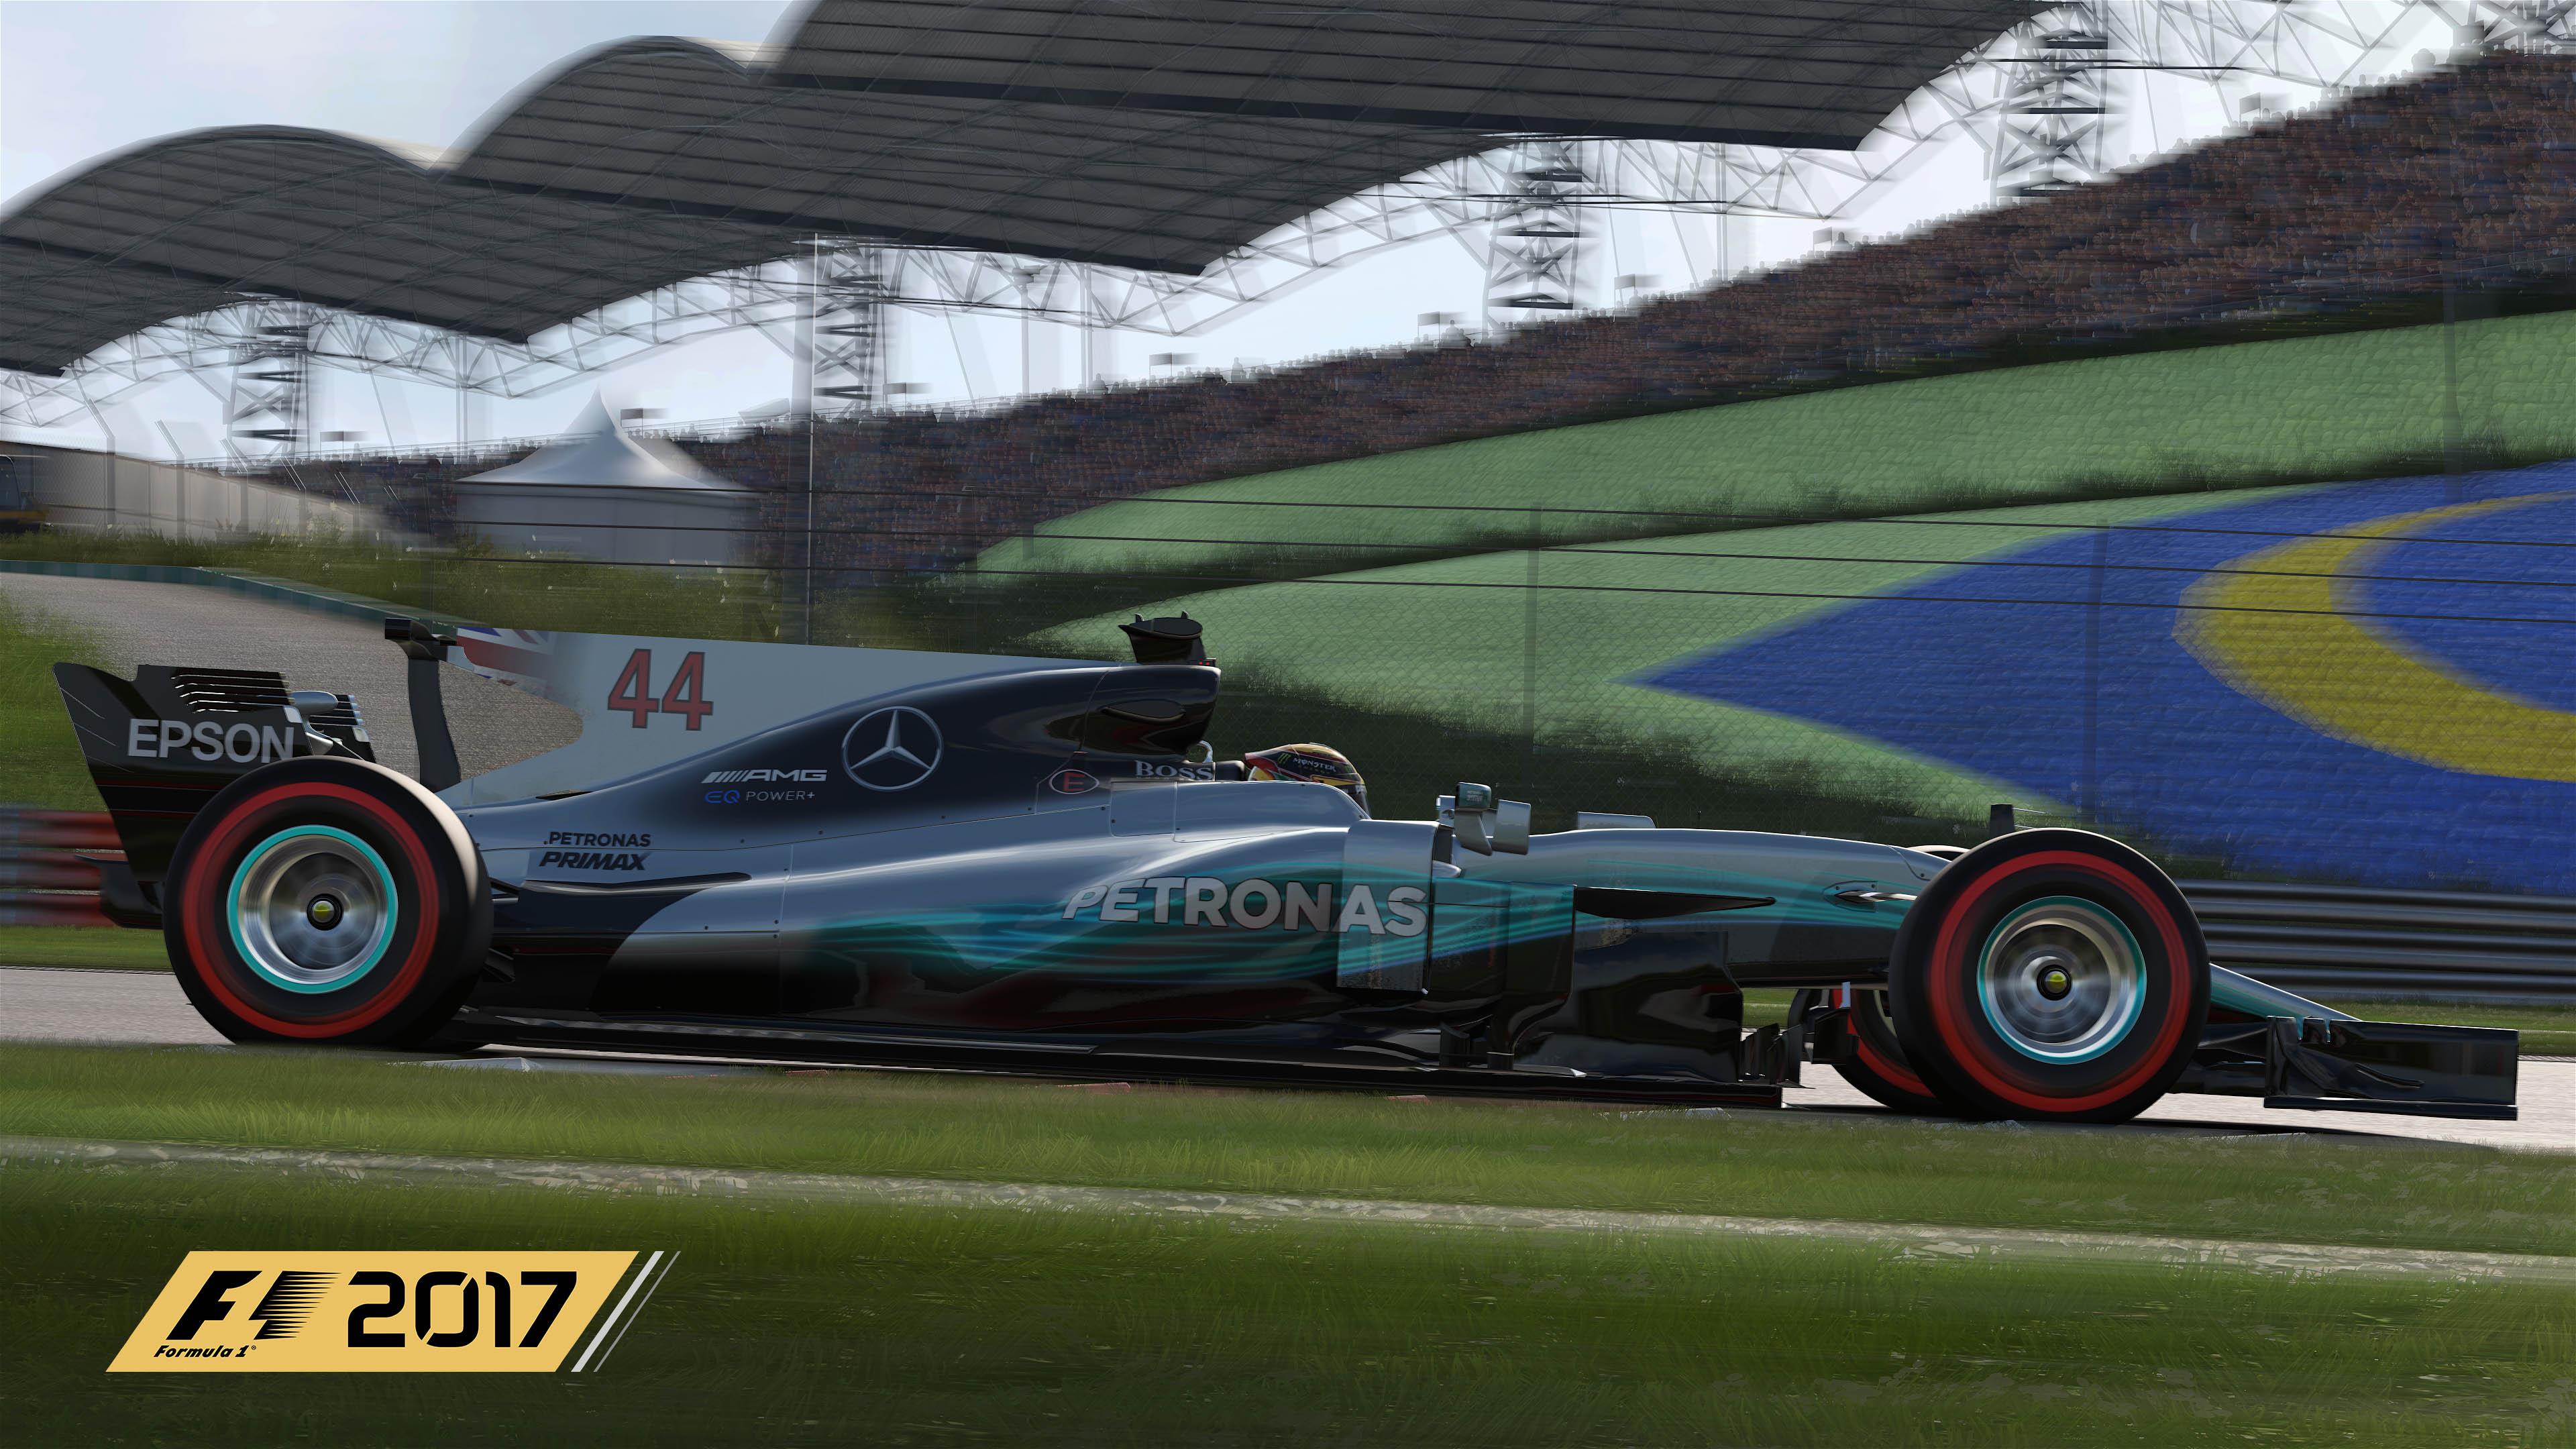 F1 2017 new liveries 8